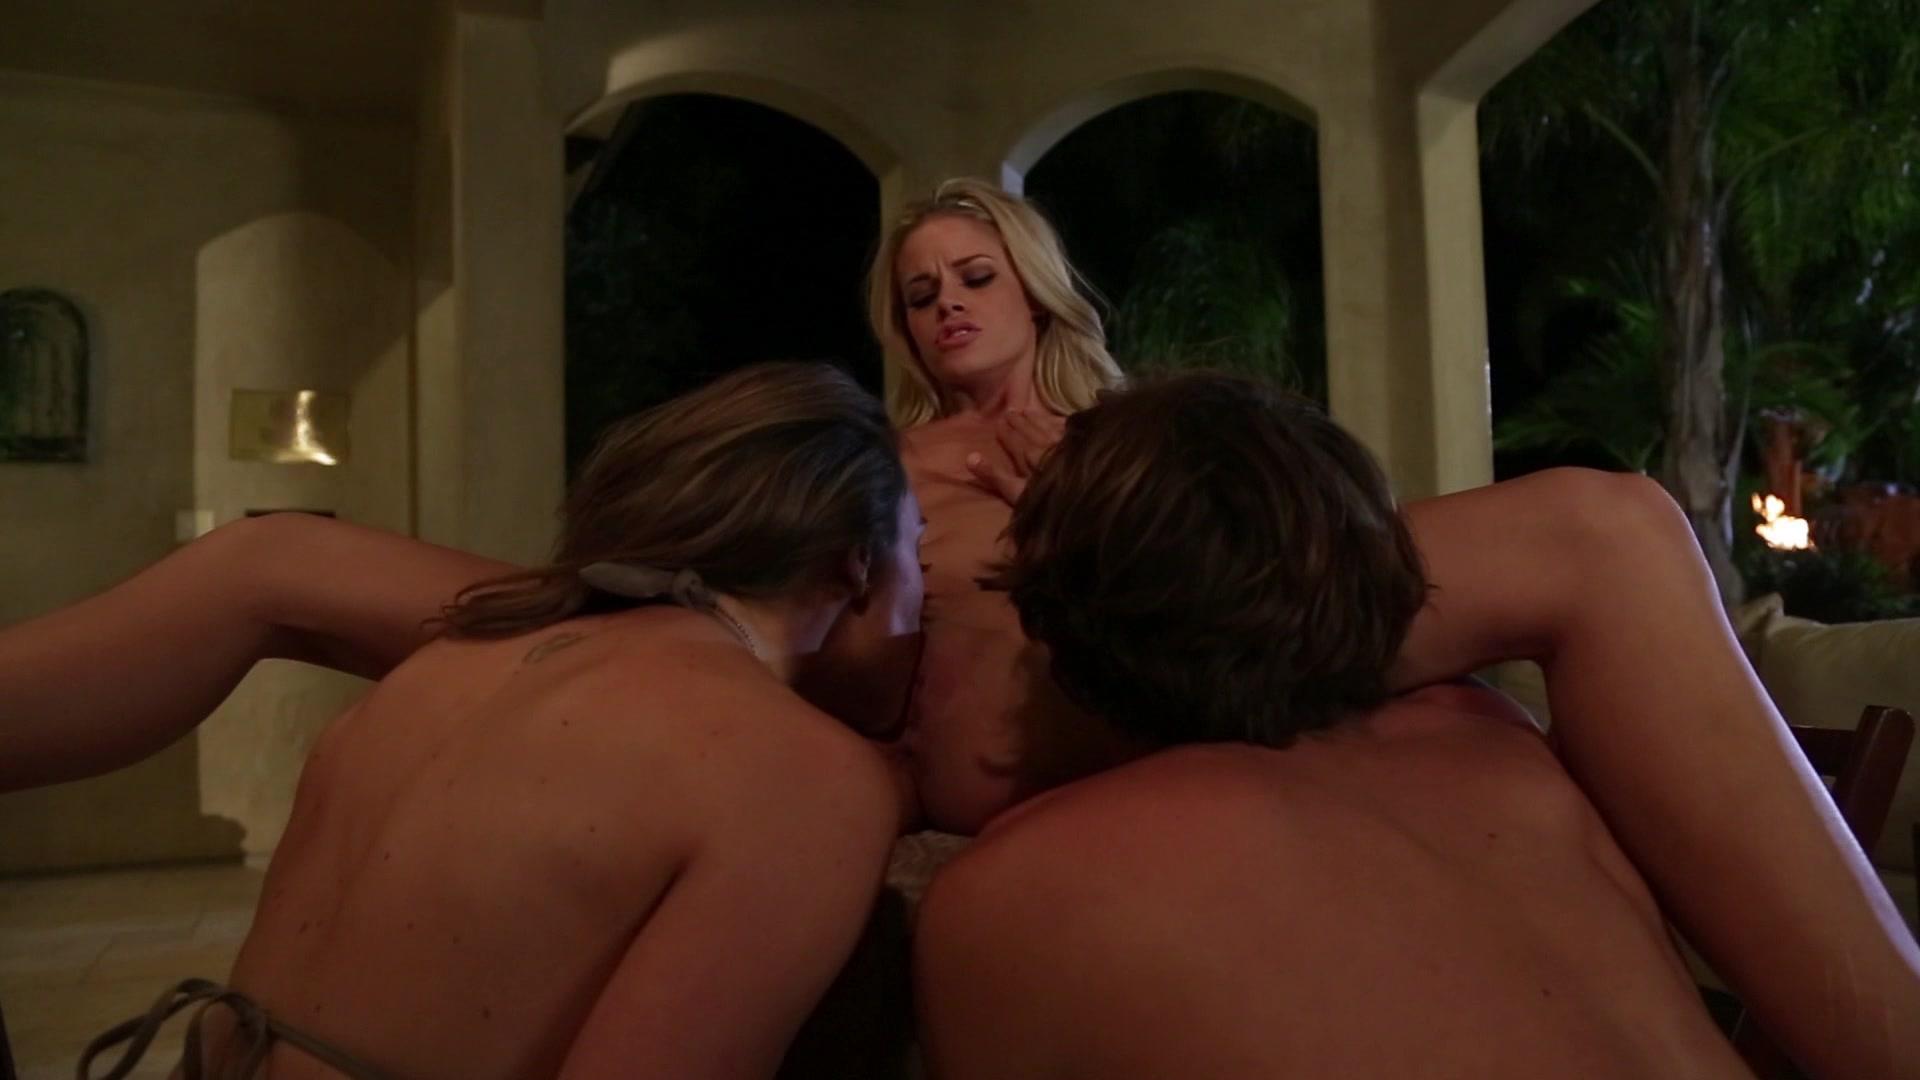 high quality anal porn